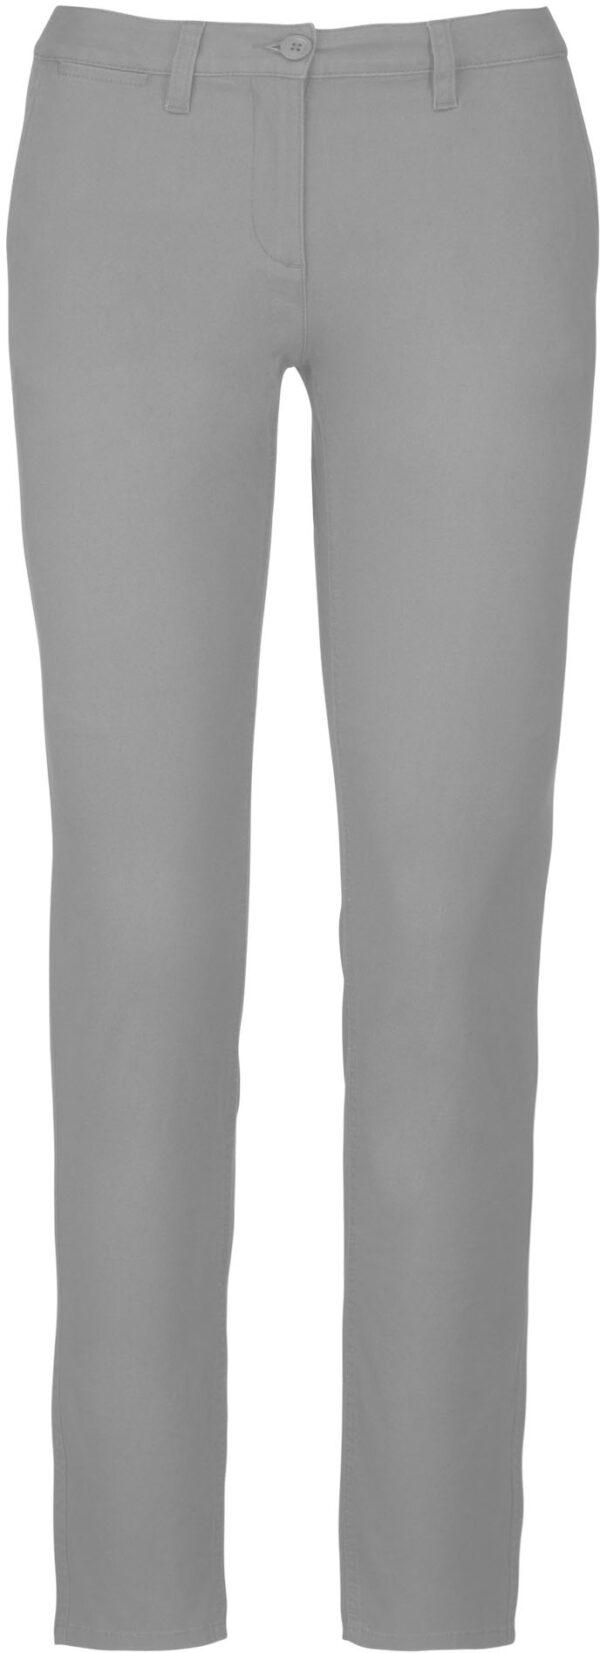 Pantalon Femme Blanc gris